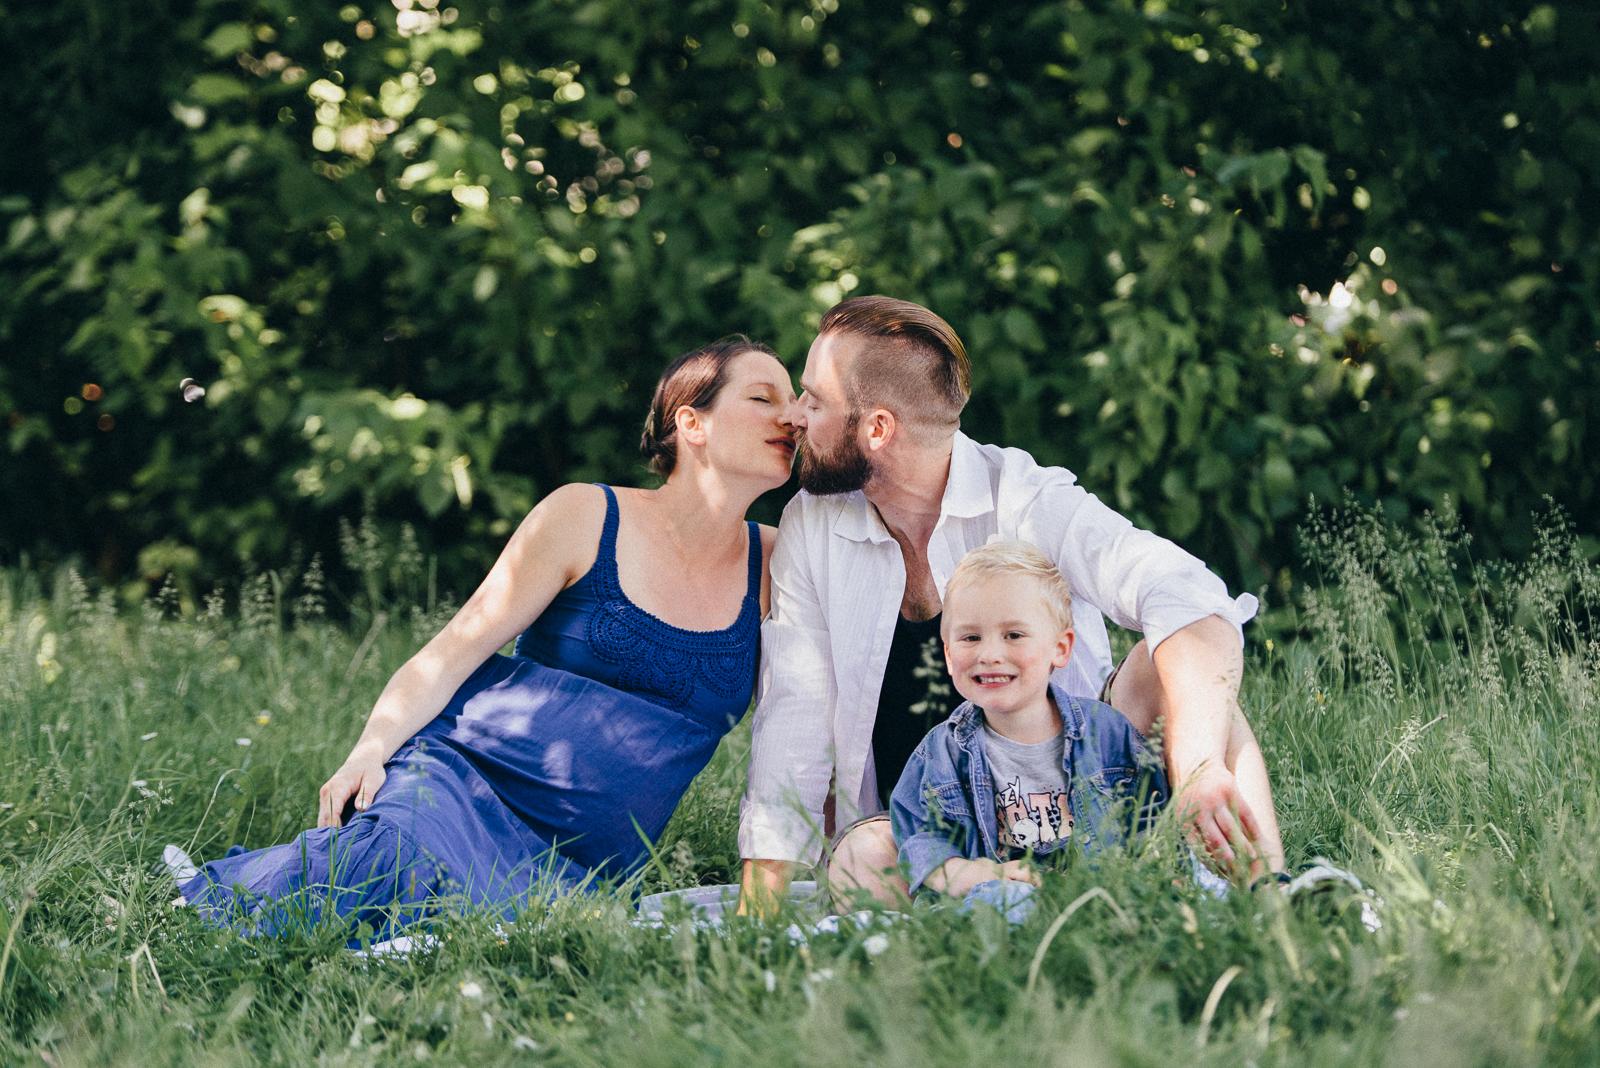 004-designparaplus-familie-fotografie-essen-familienshooting